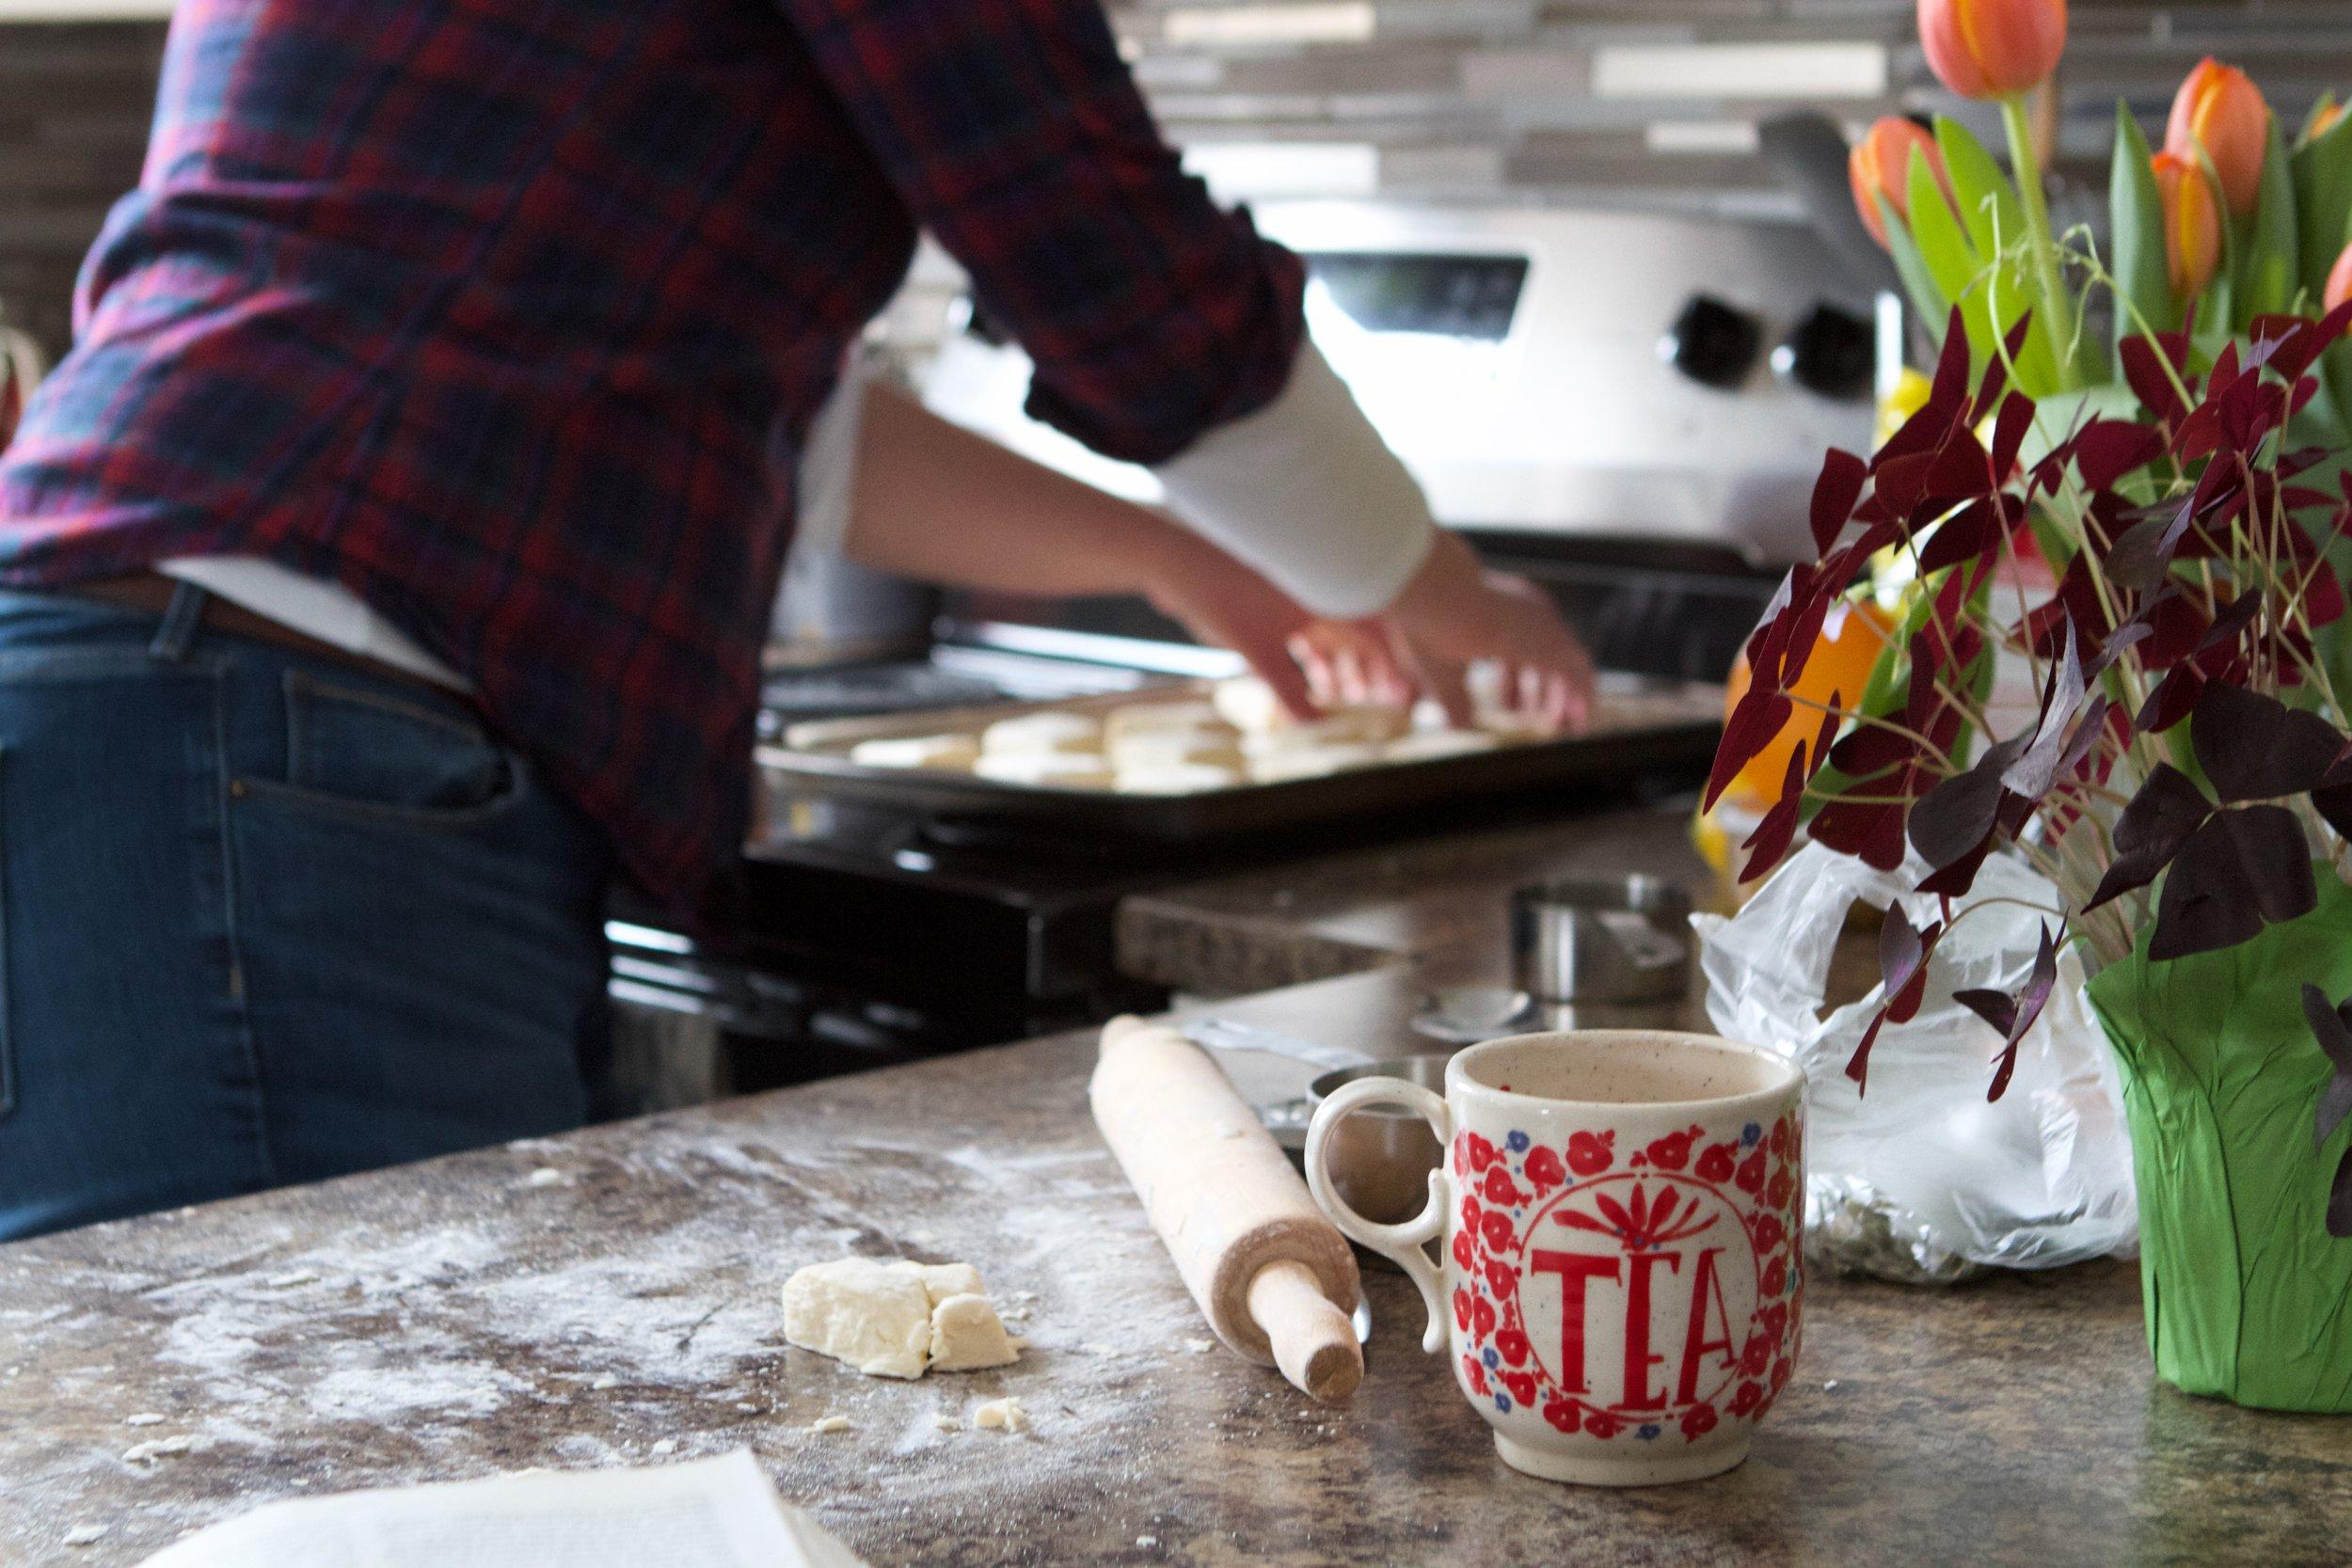 tea mug hands on biscuits.jpg